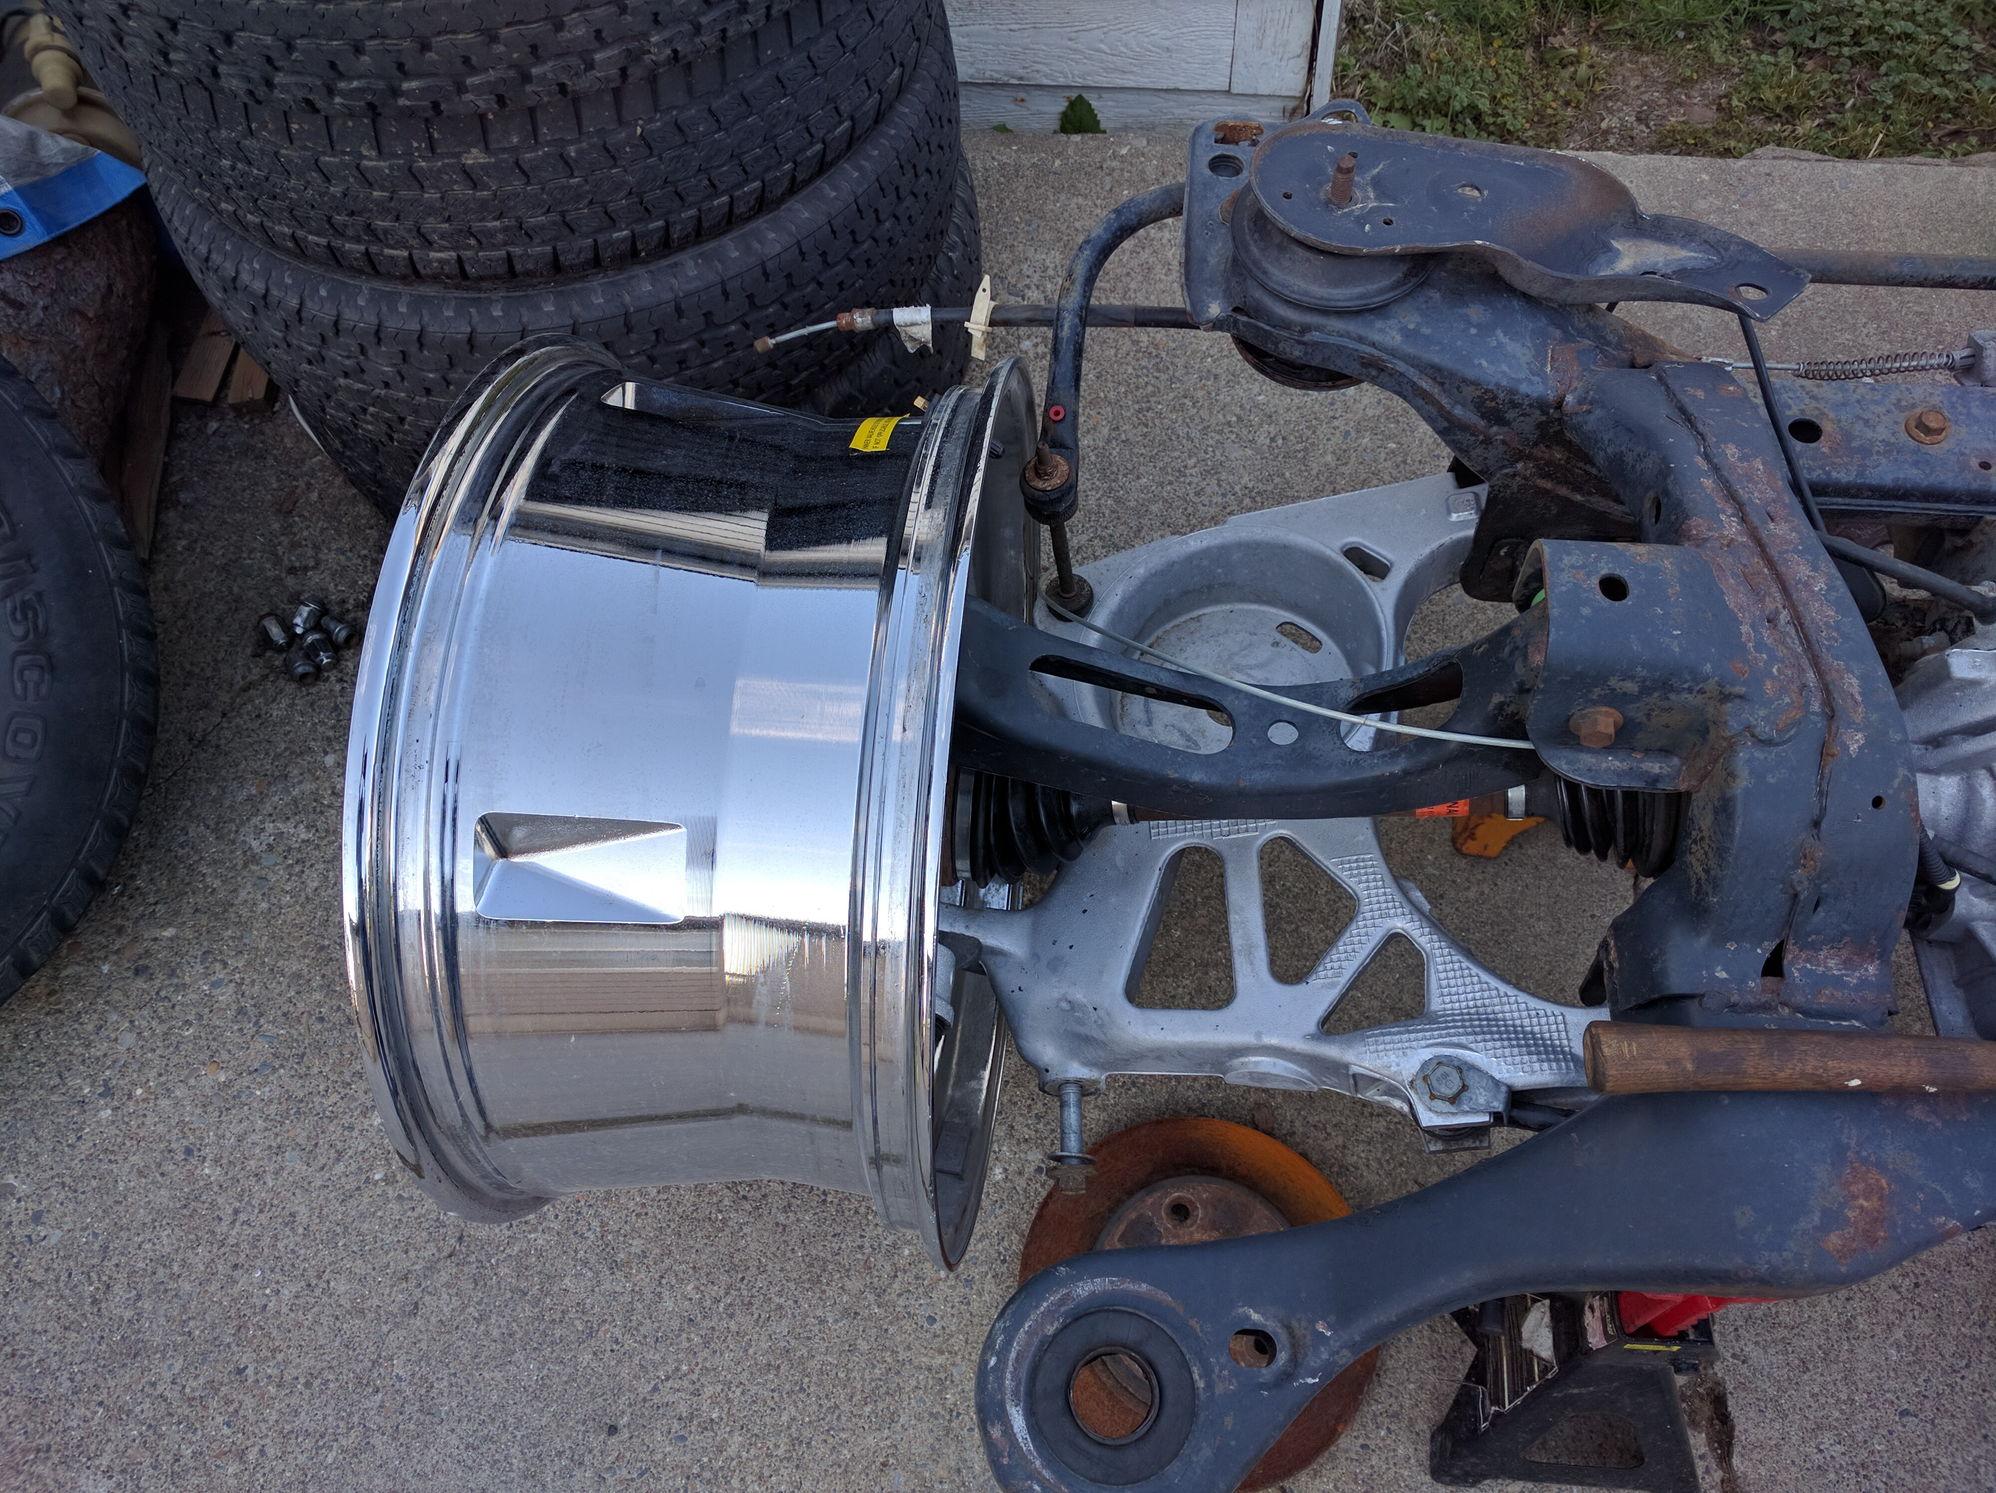 F100 Irs Swap Kit